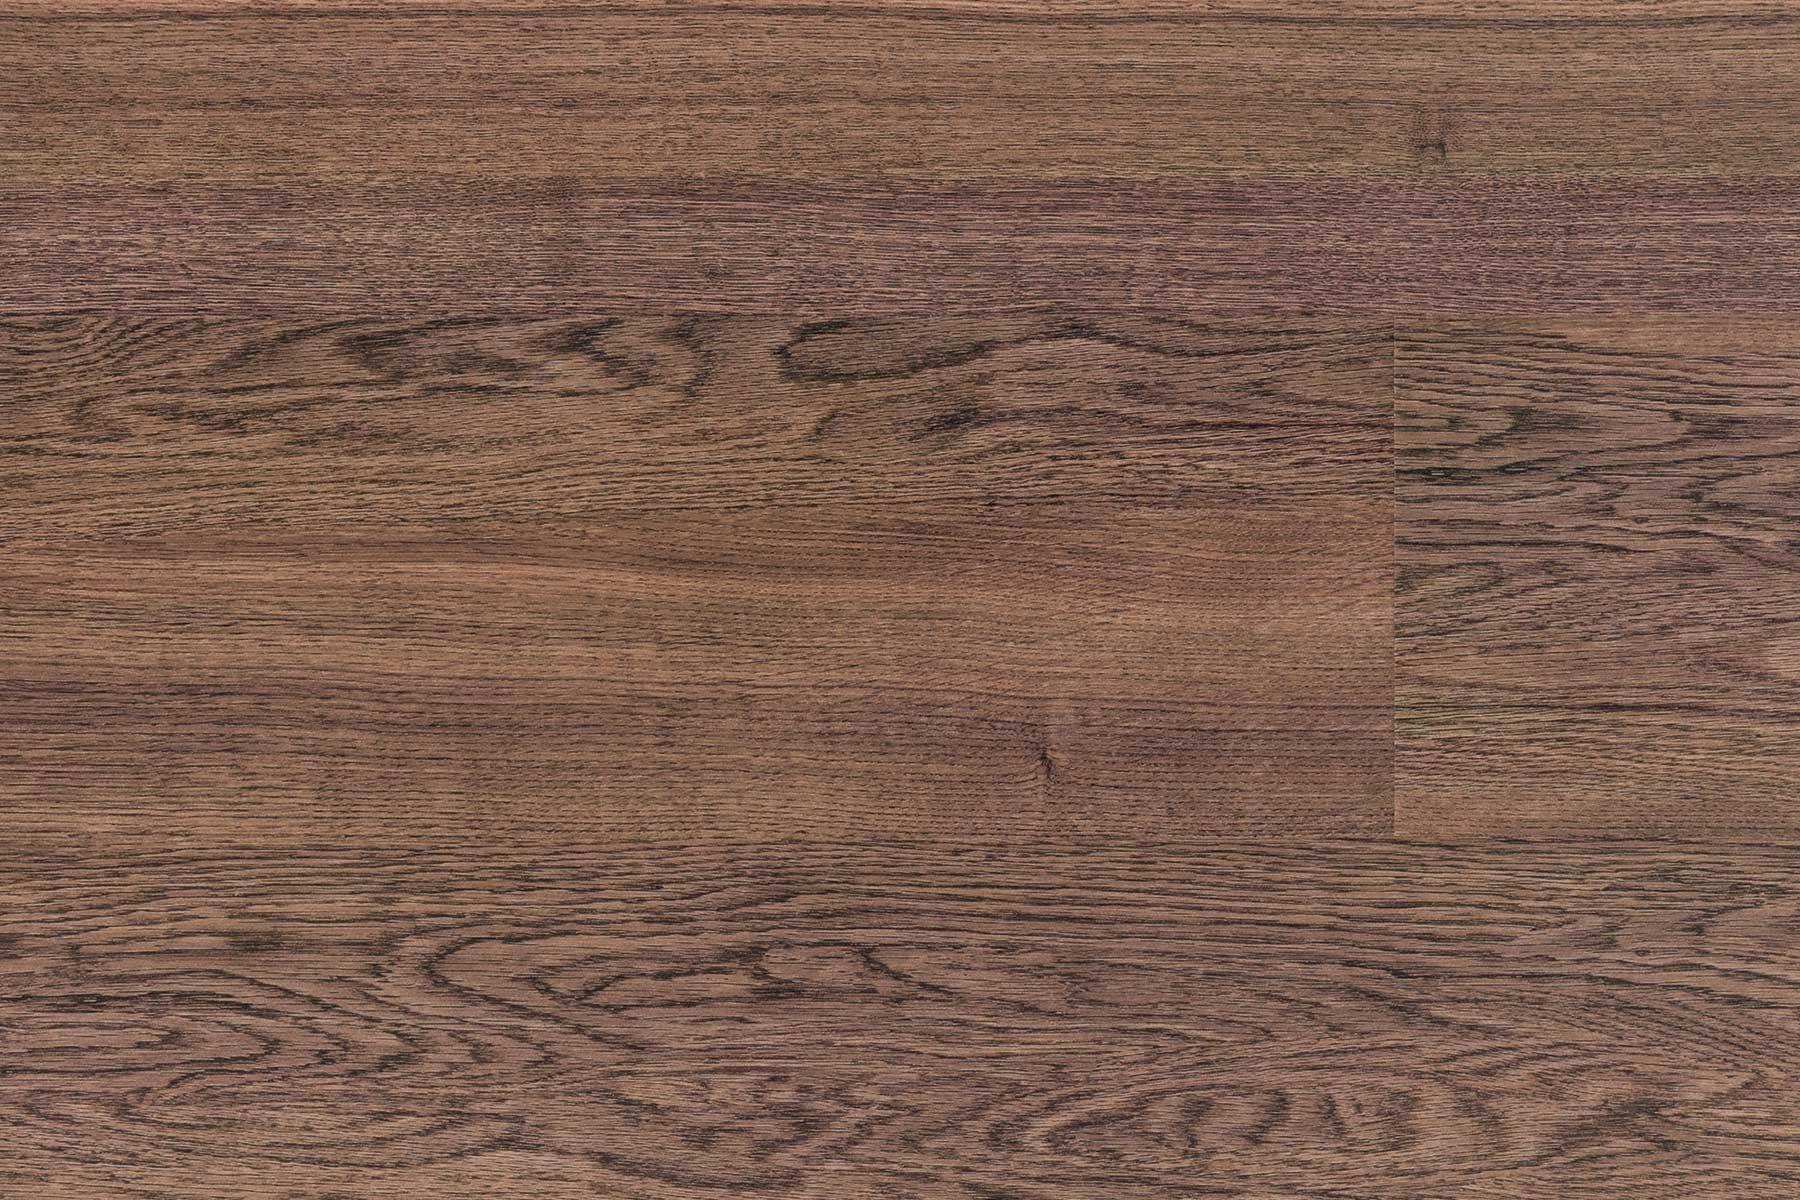 Pc cork ta tesoro woods for Cork flooring wood grain look